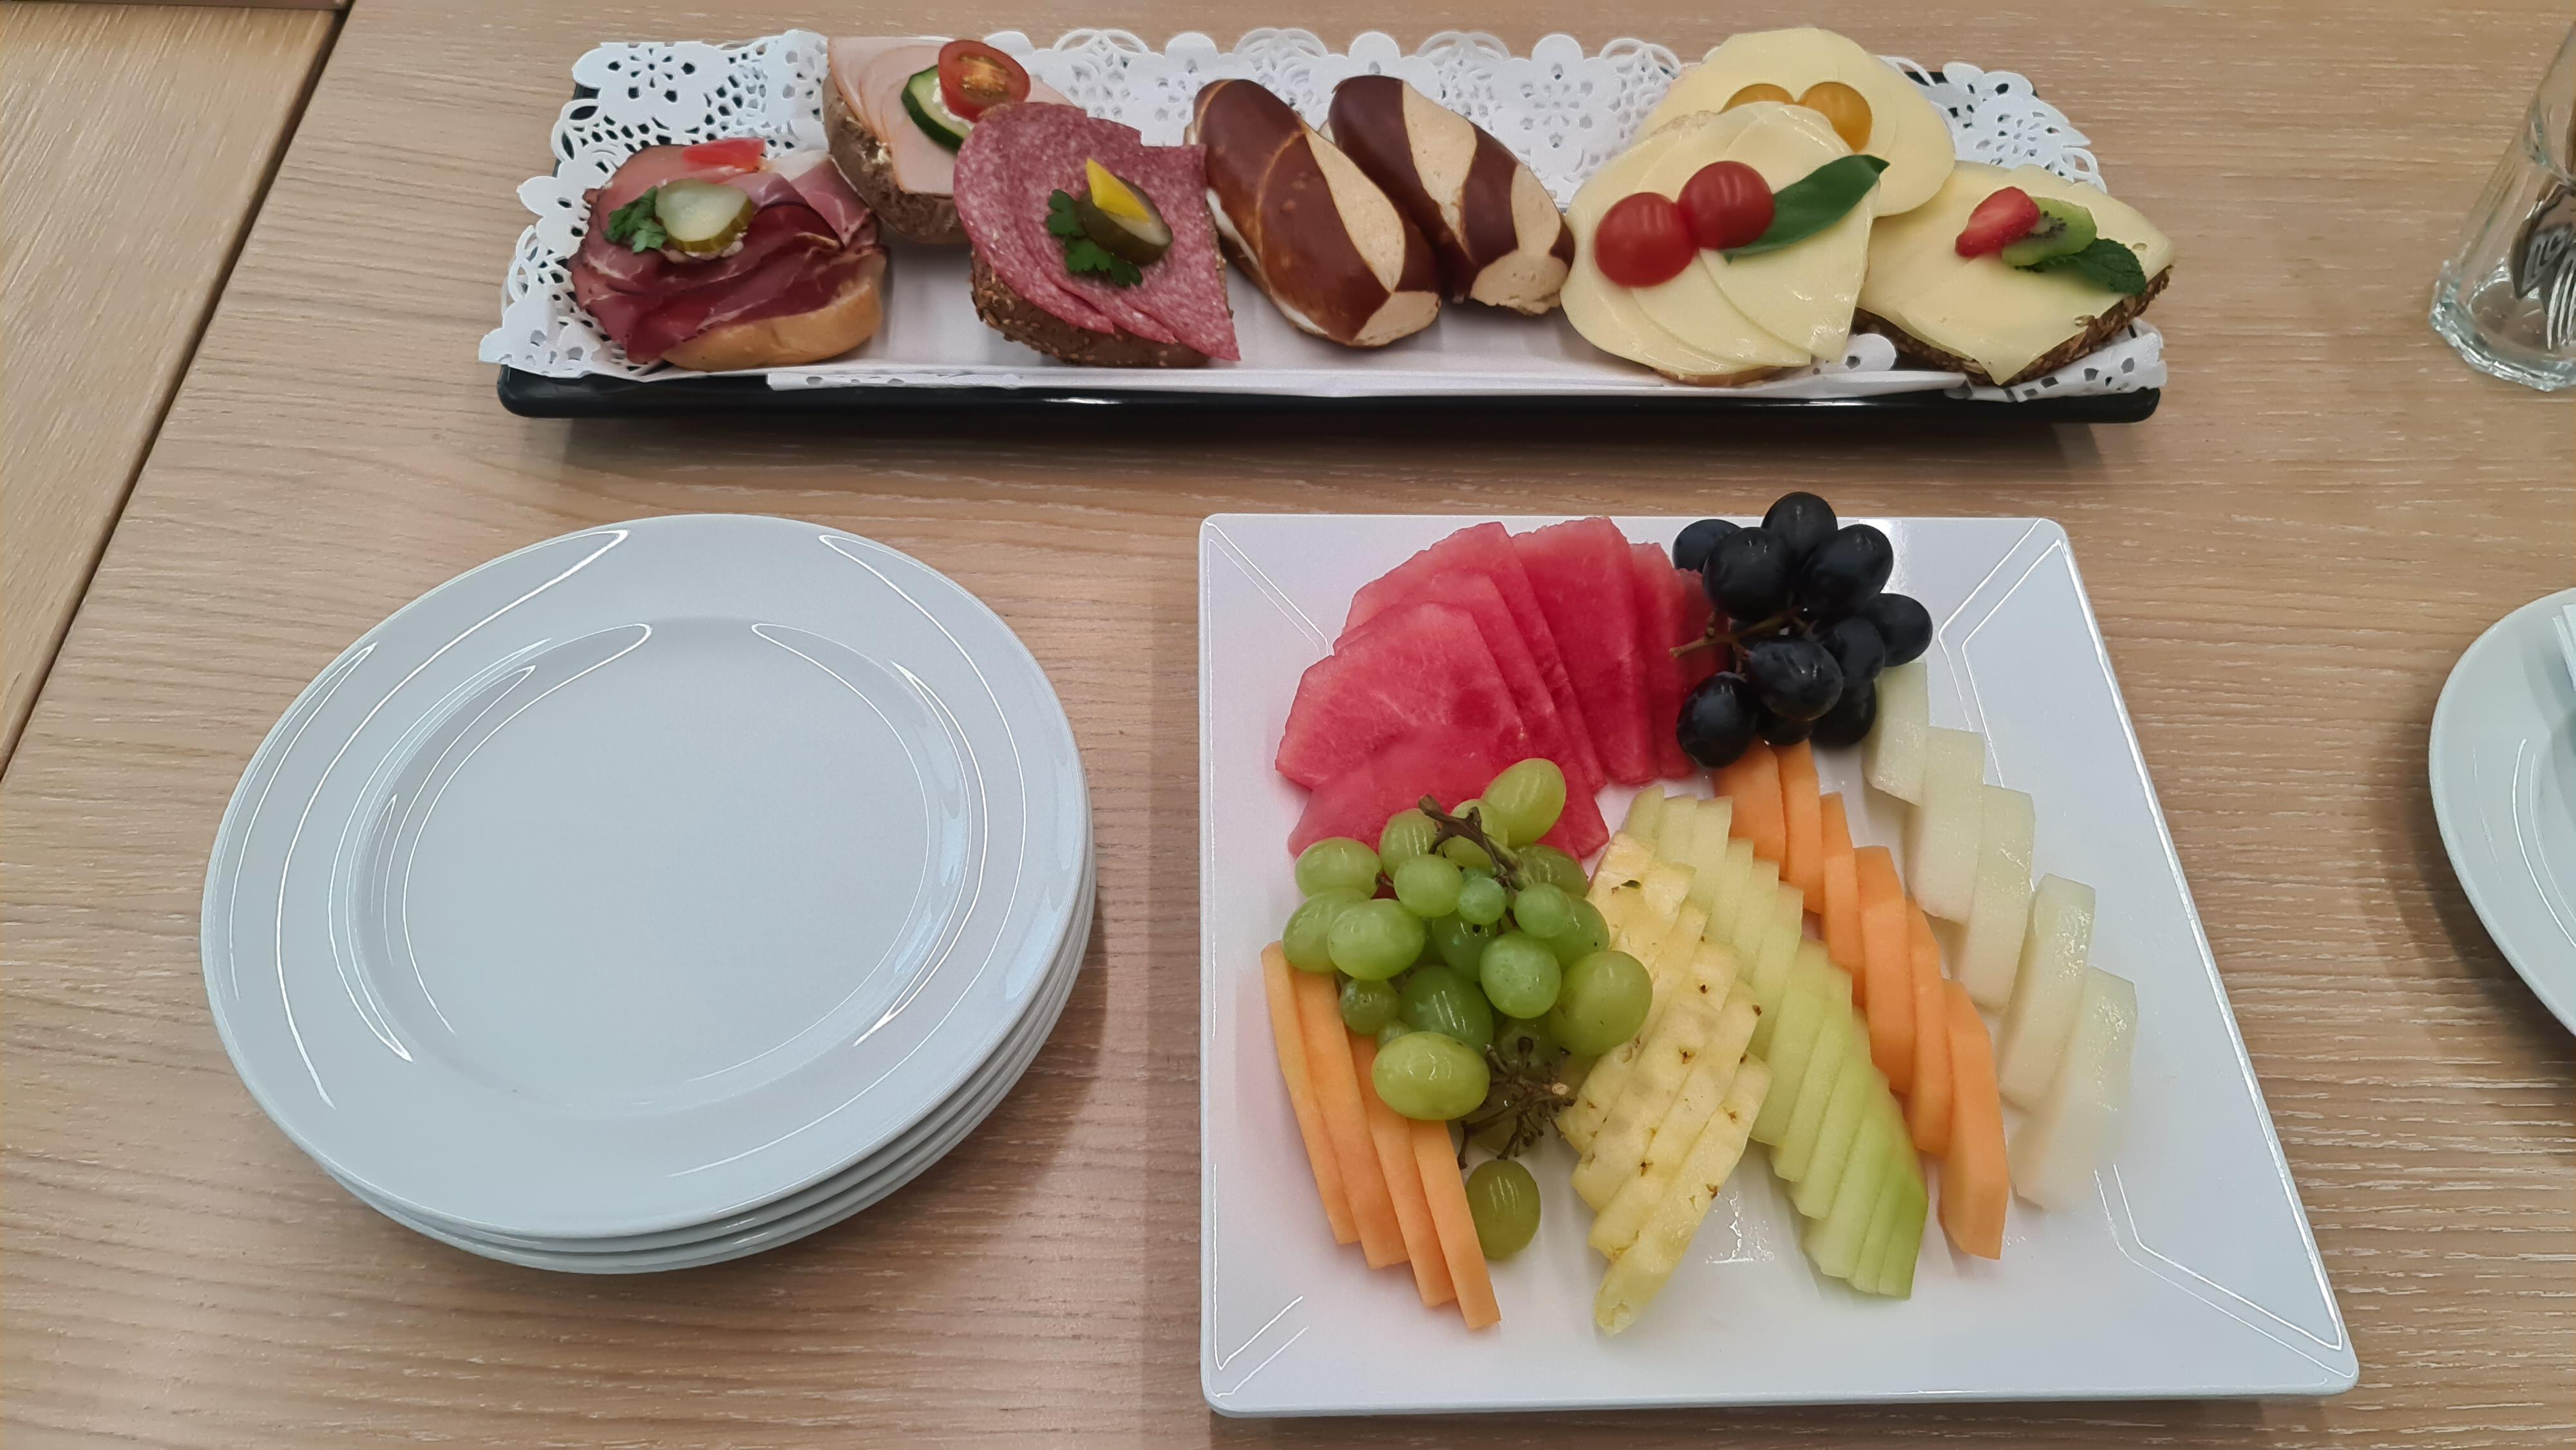 https://foodloader.net/Holz_2020-07-28_Snacks.jpg